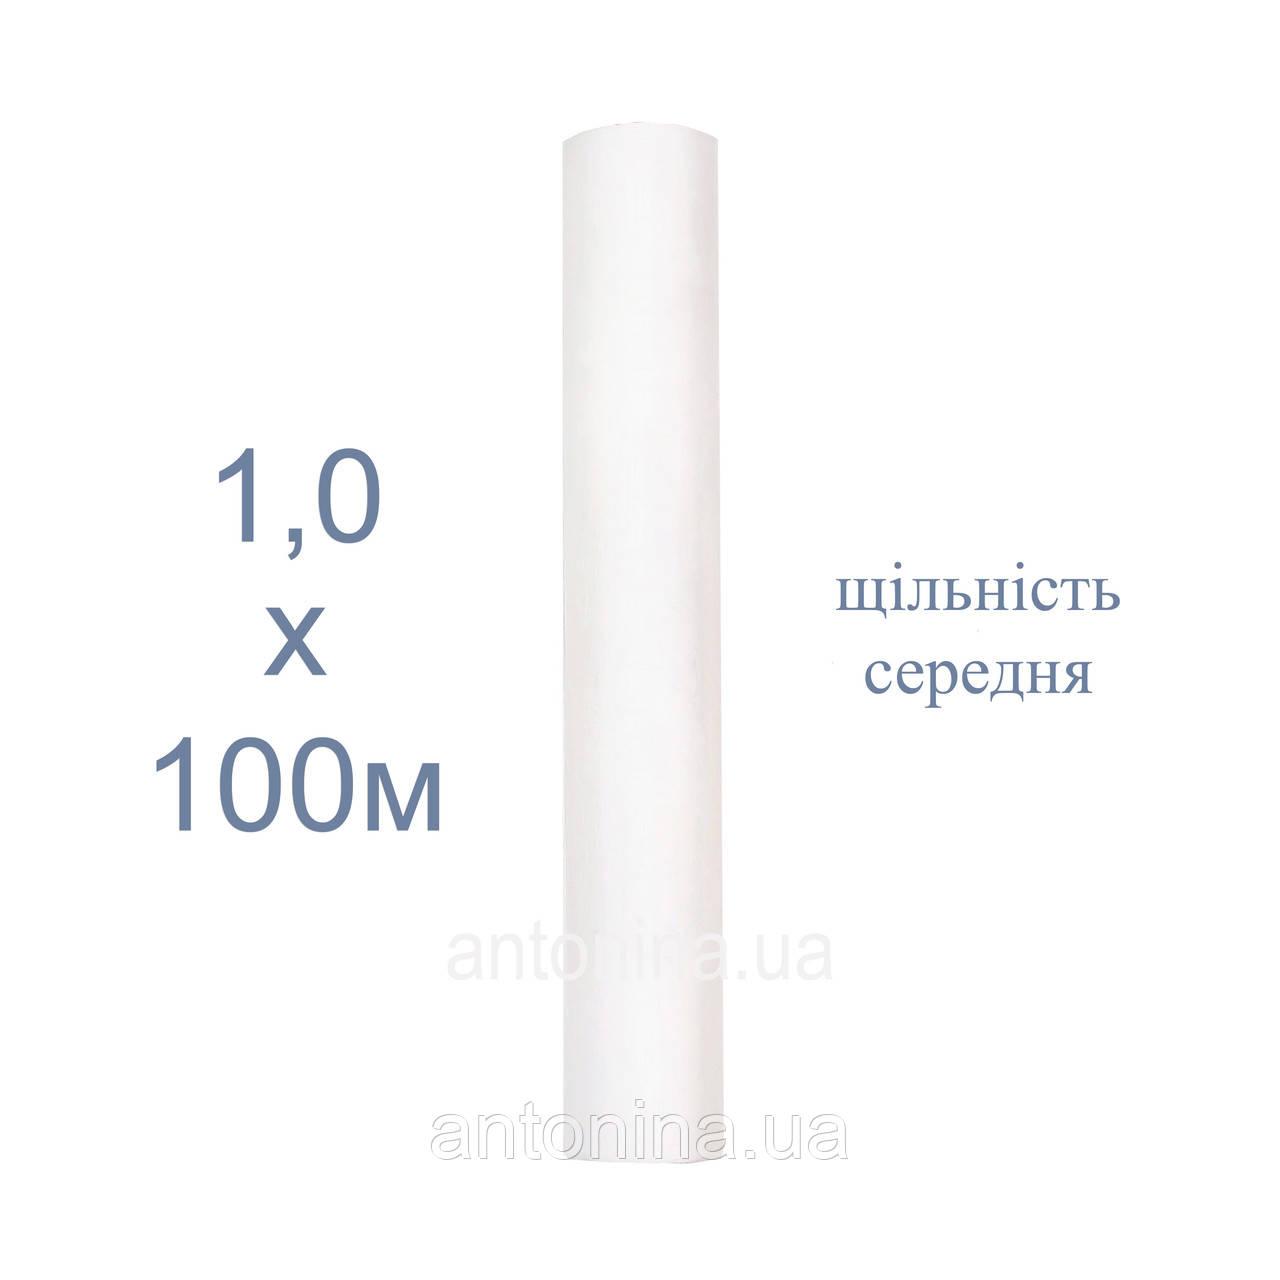 "Простыни одноразовые белые 1,0х100м (пл.средн) ТМ ""Антонина"", спанбонд"